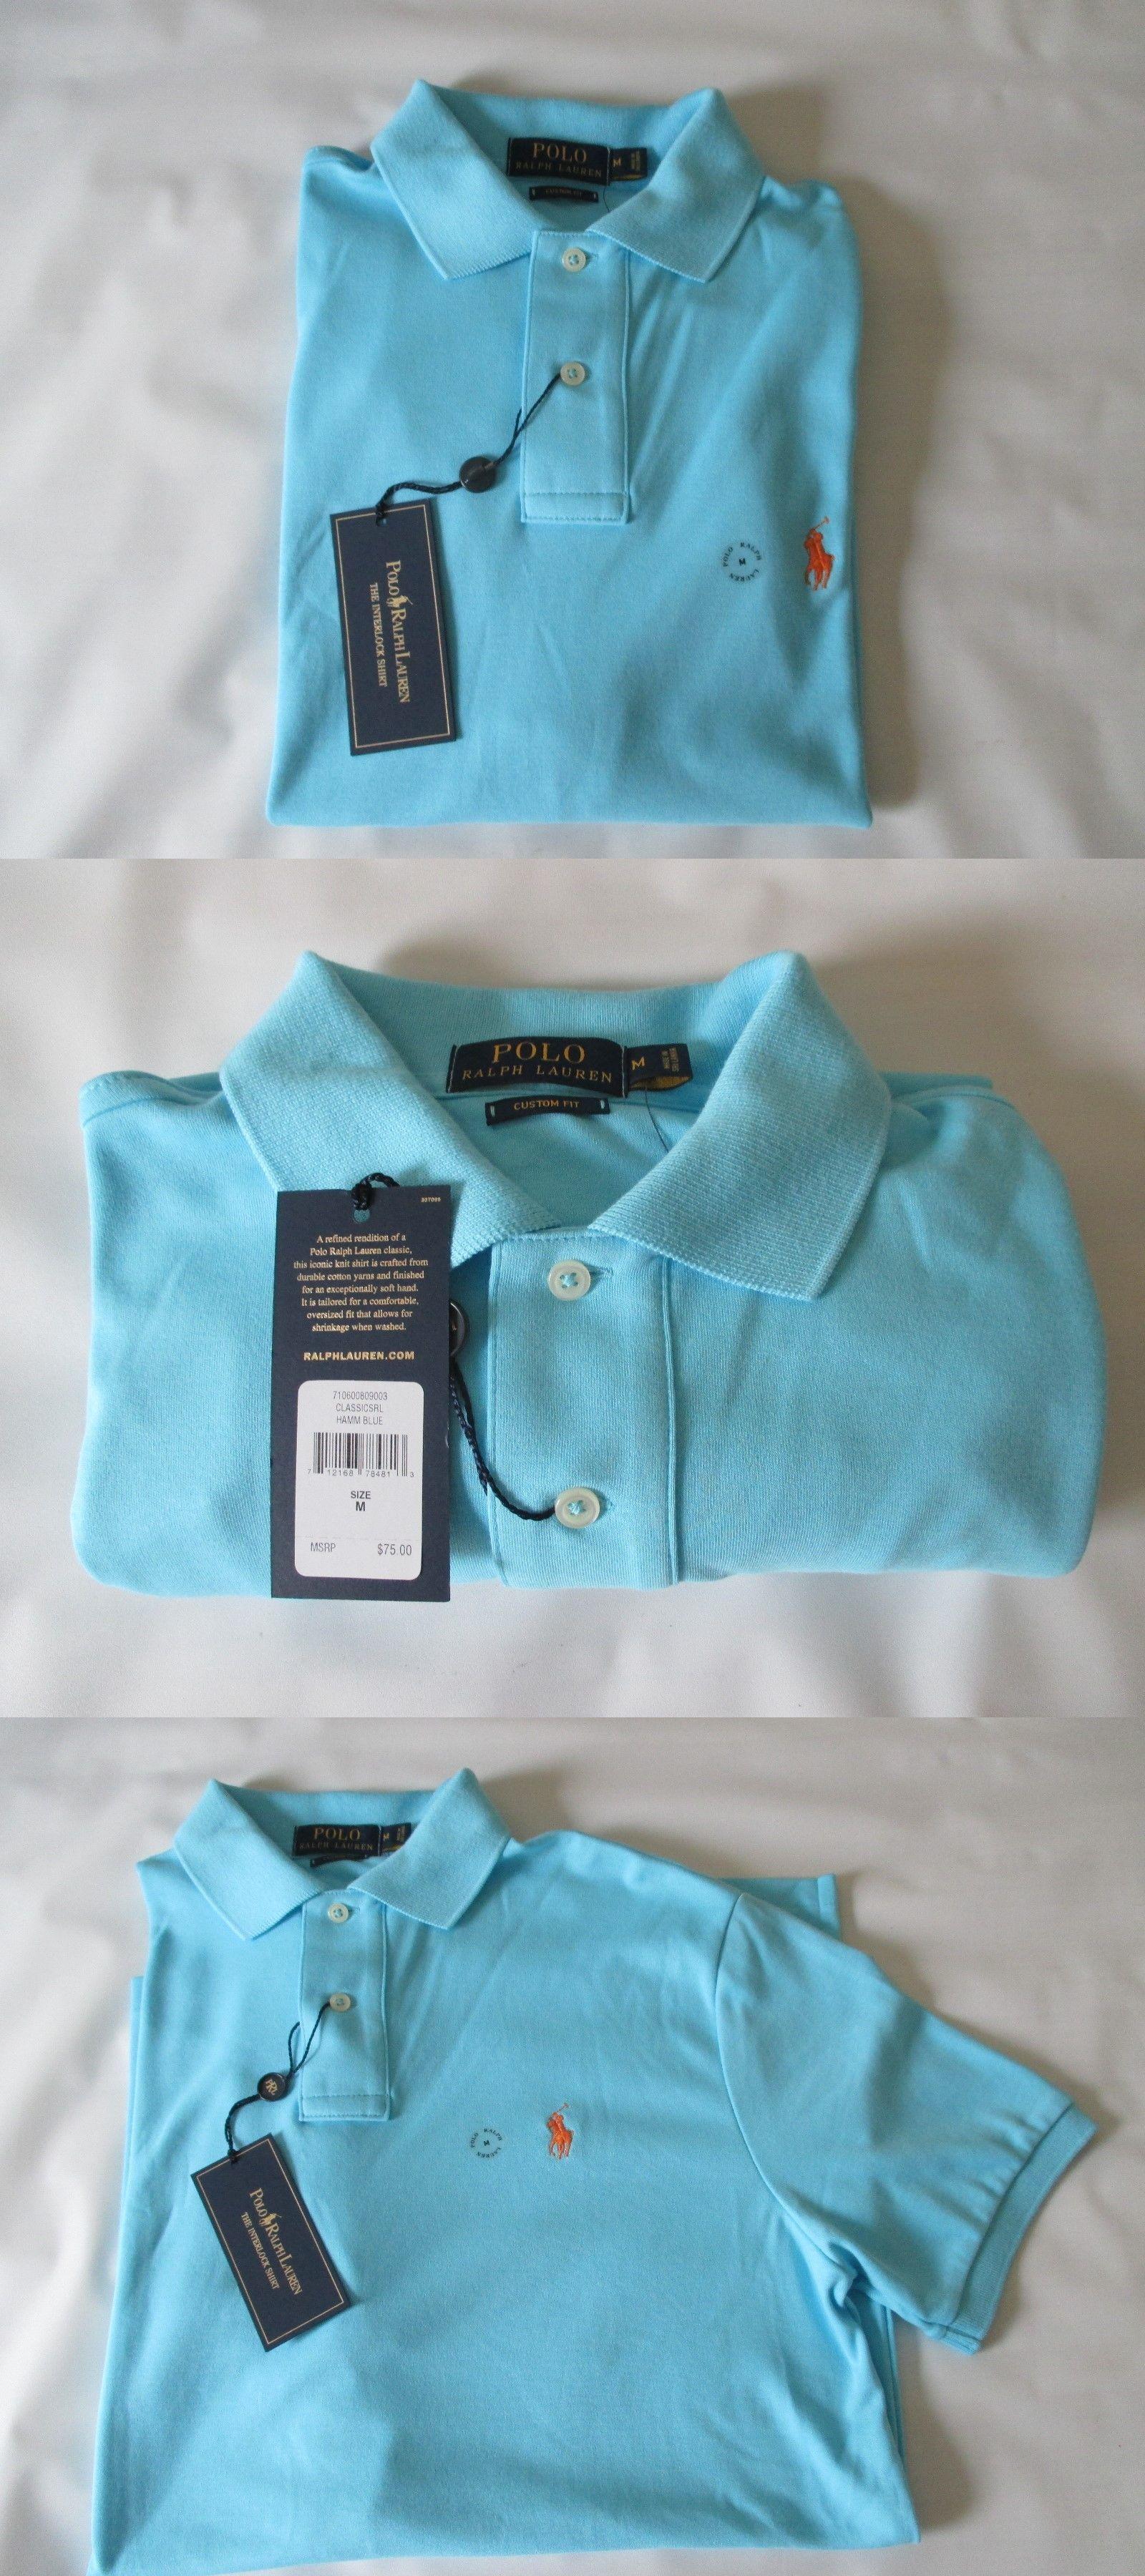 ff55dba0c Casual Shirts 57990  Nwt Ralph Lauren Blue Soft 100% Cotton Polo Shirt - Men